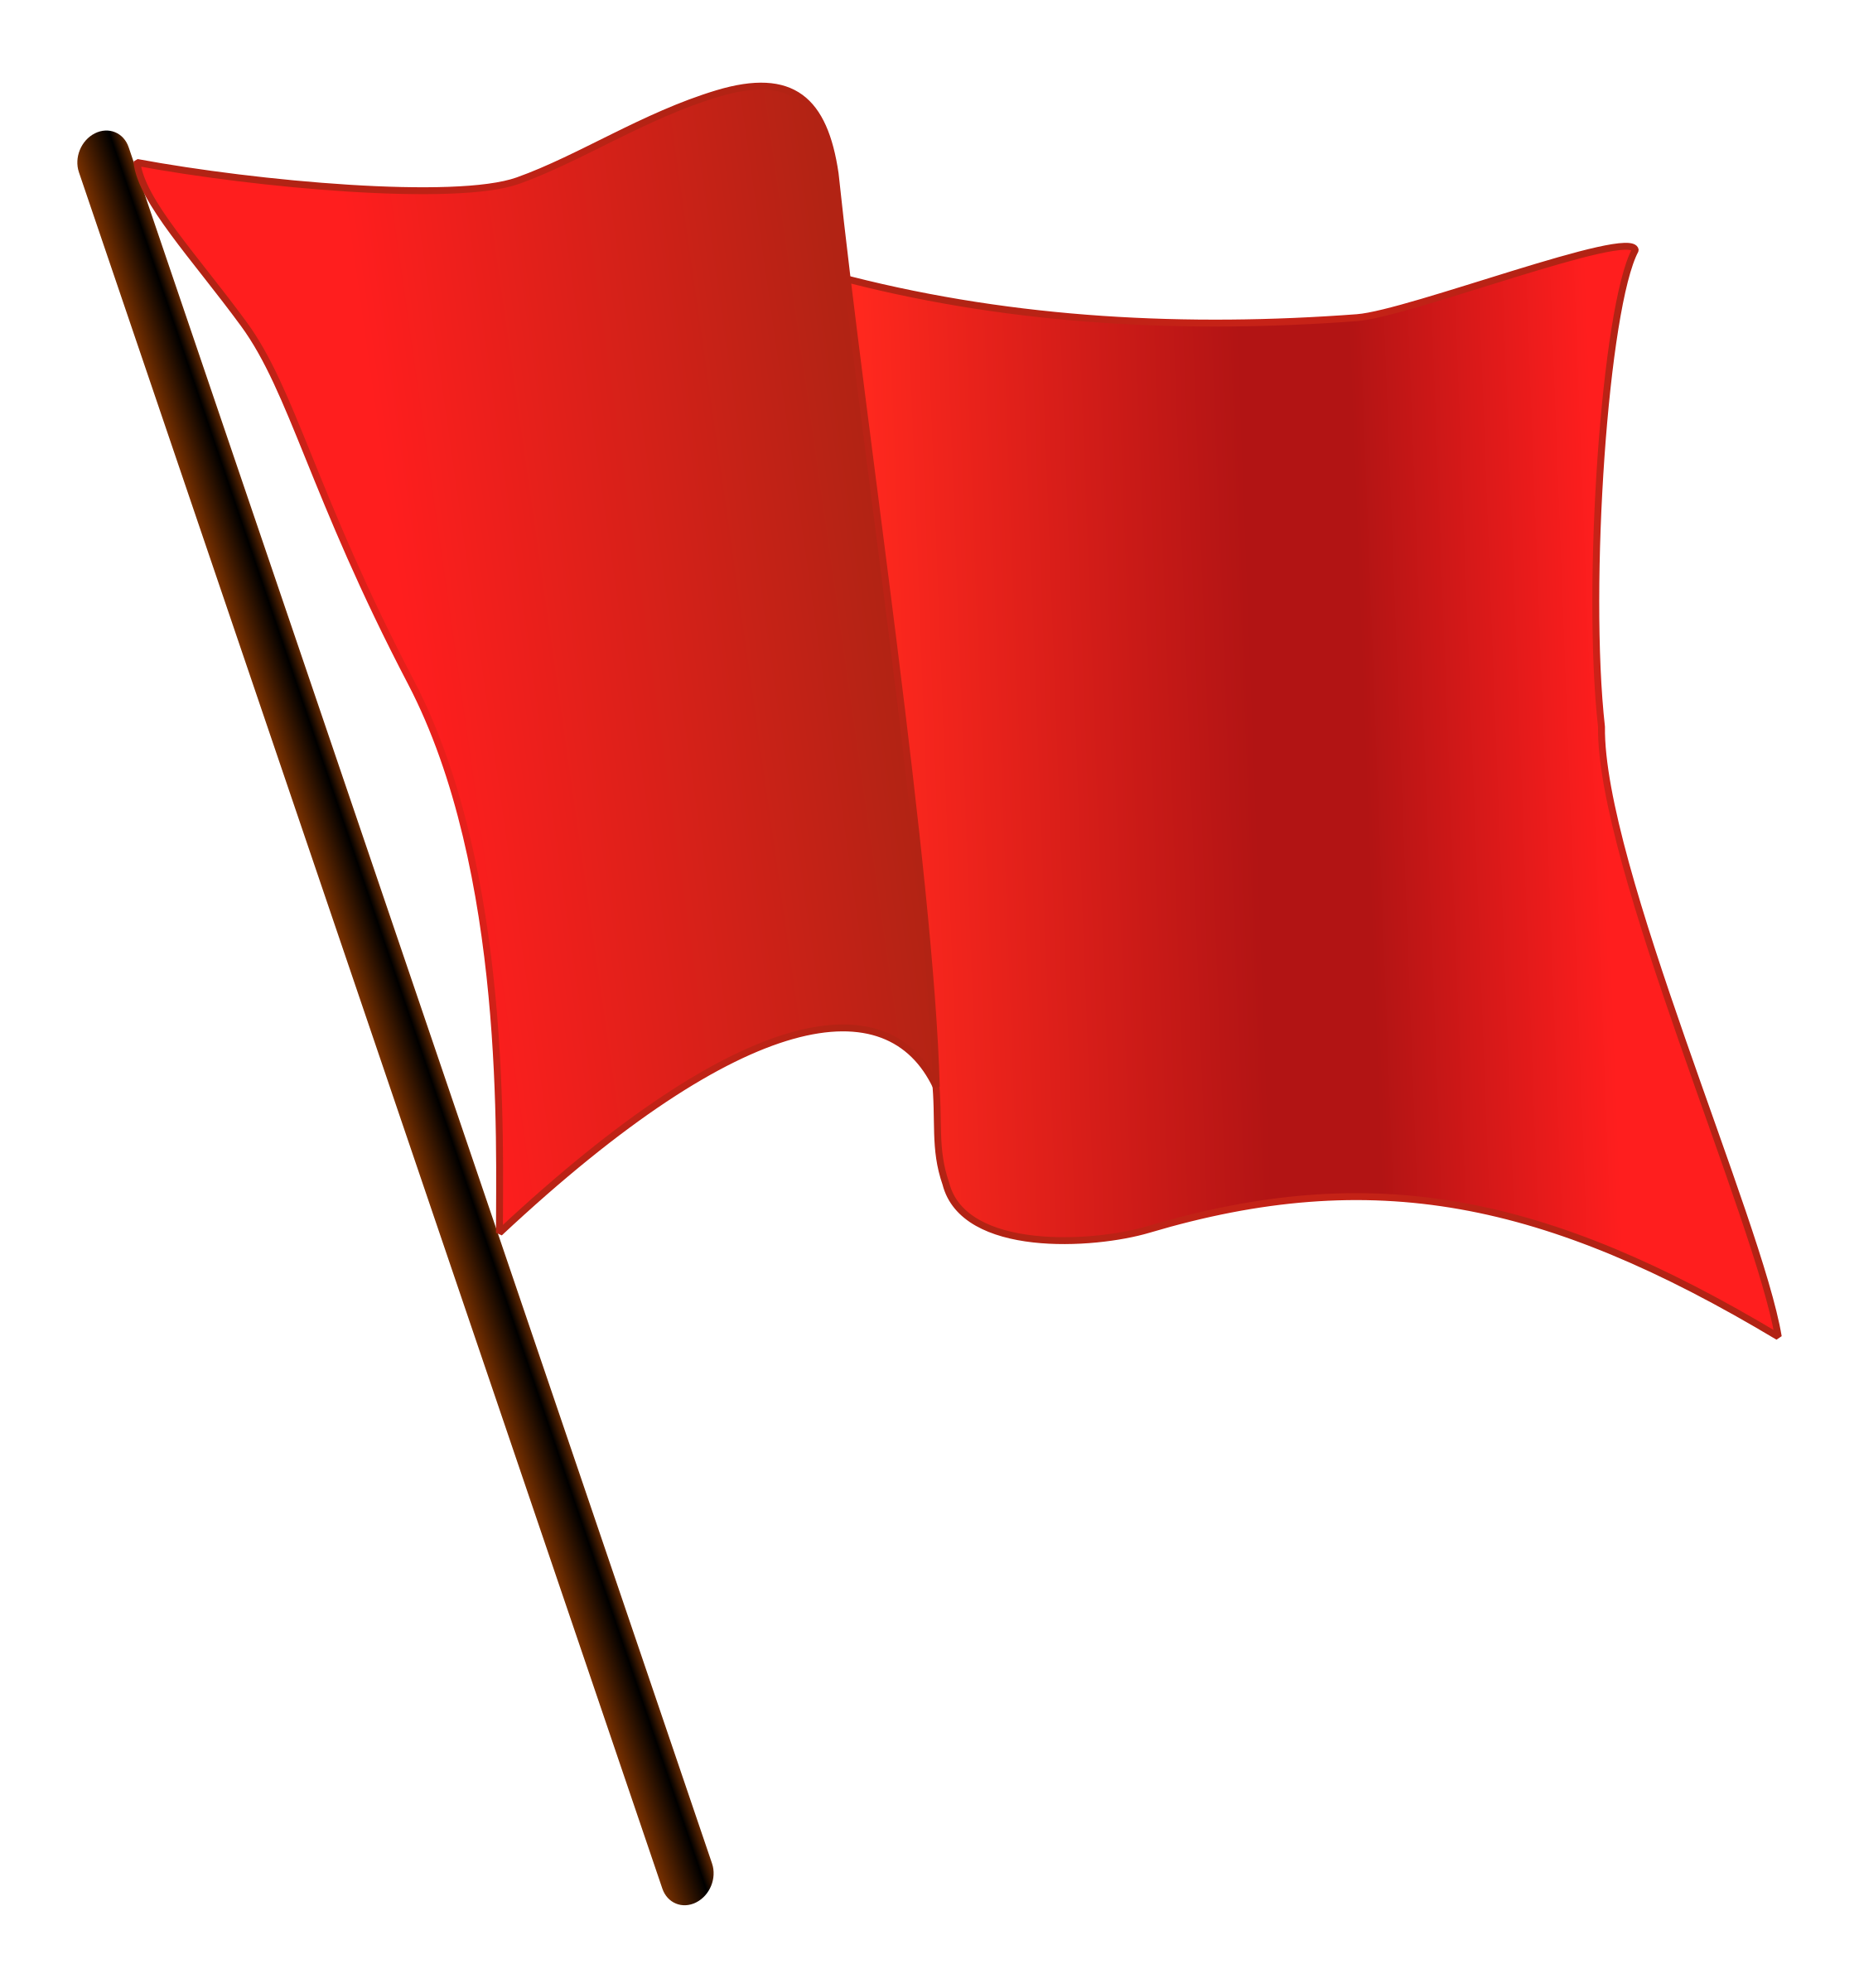 Flag clipart 3 » Clipart Station.